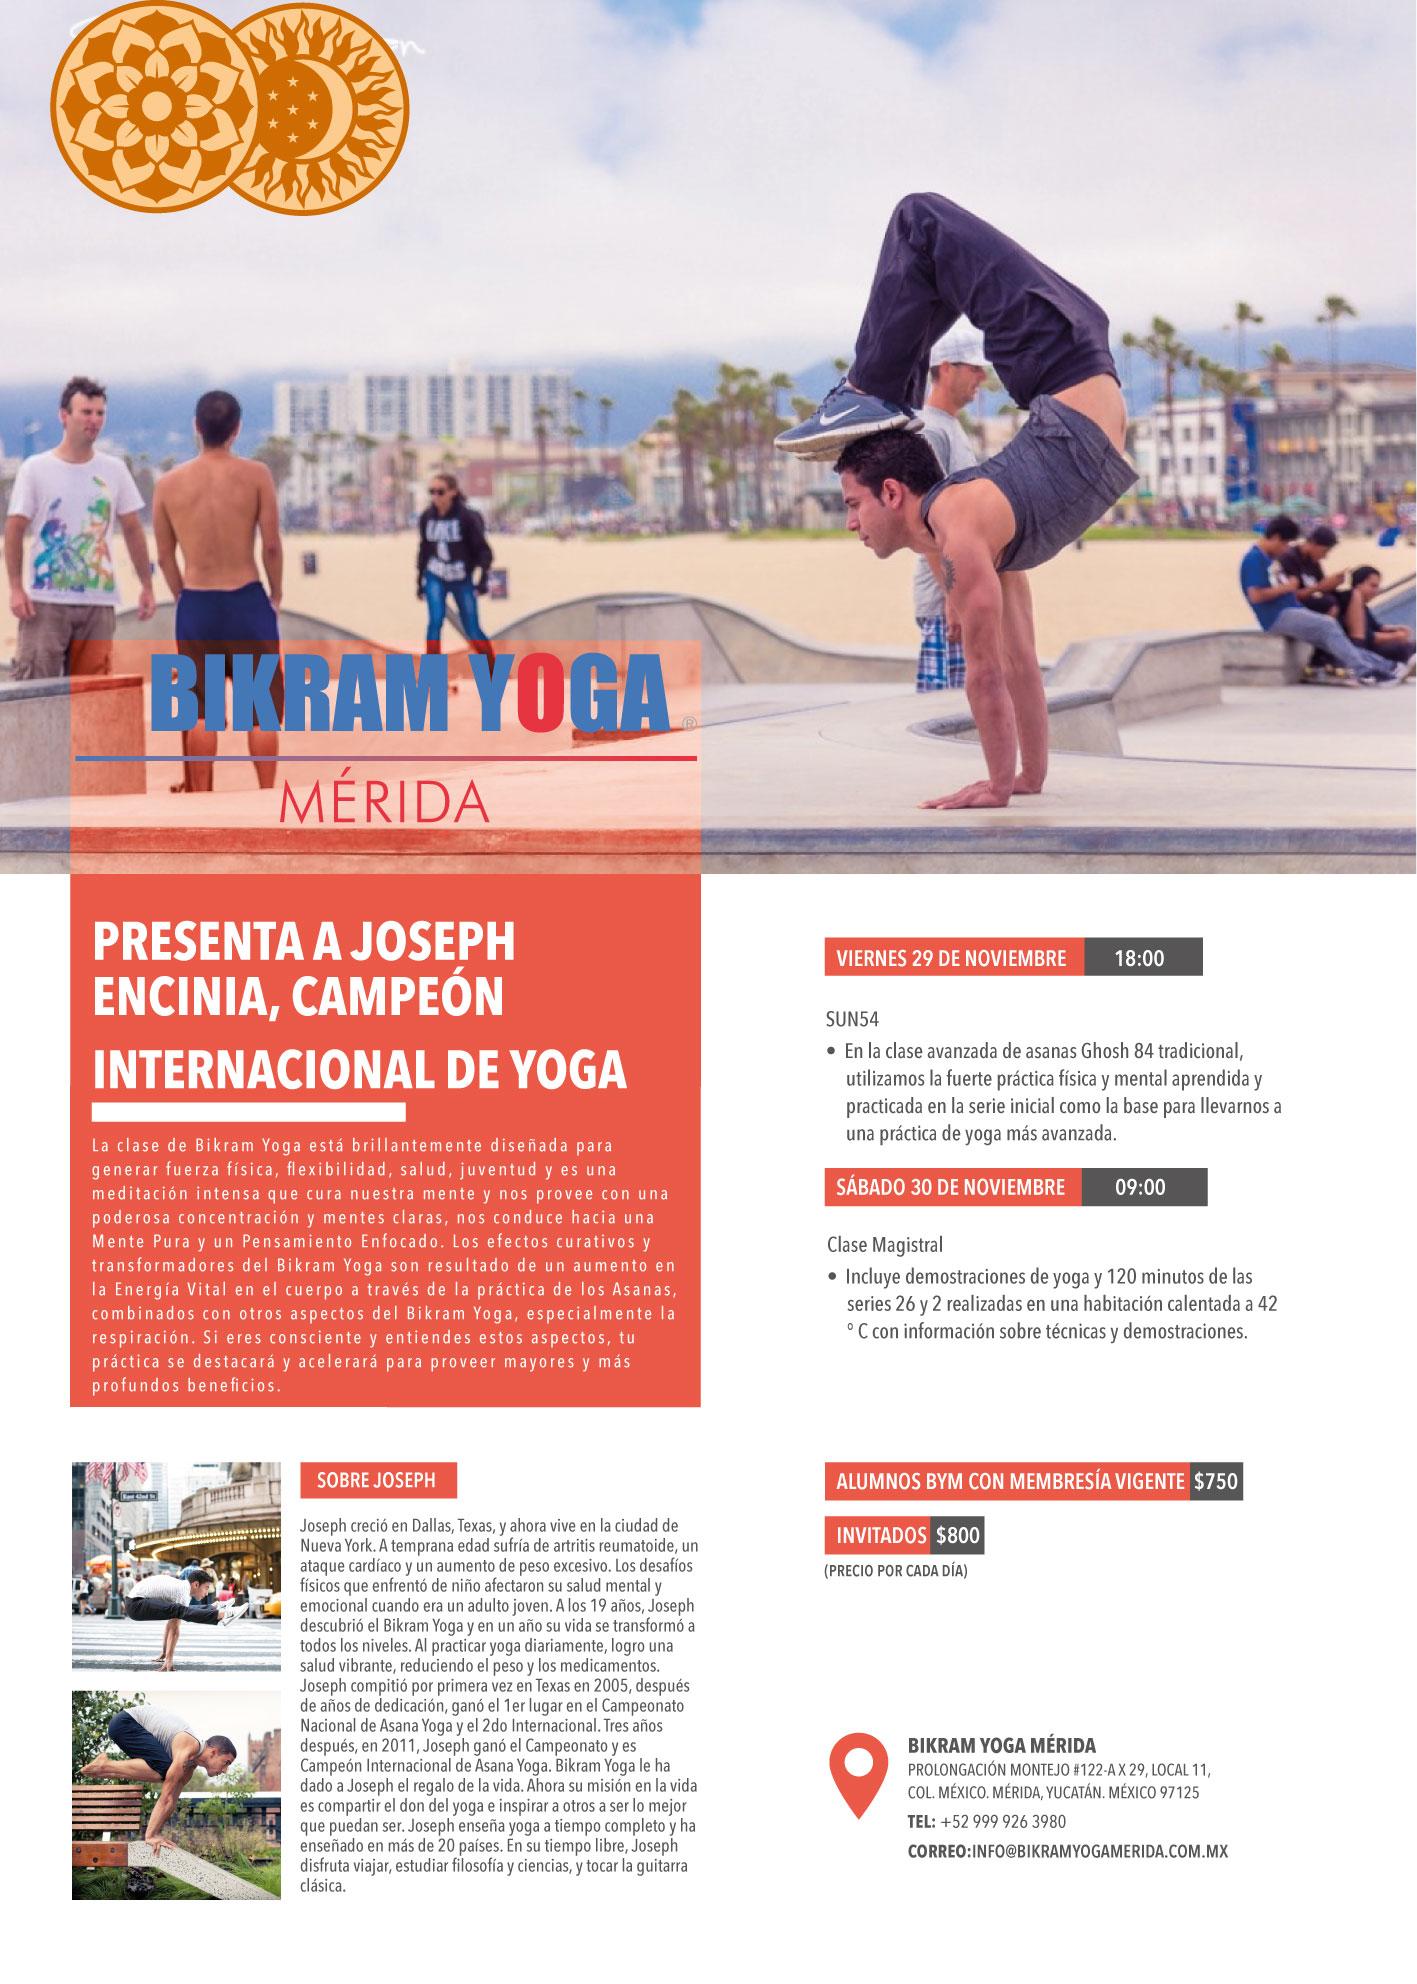 Mérida, Mexico | November 29th and 30th, 2020 | 26 & 2 Beginner & SUN54 Intermediate Series